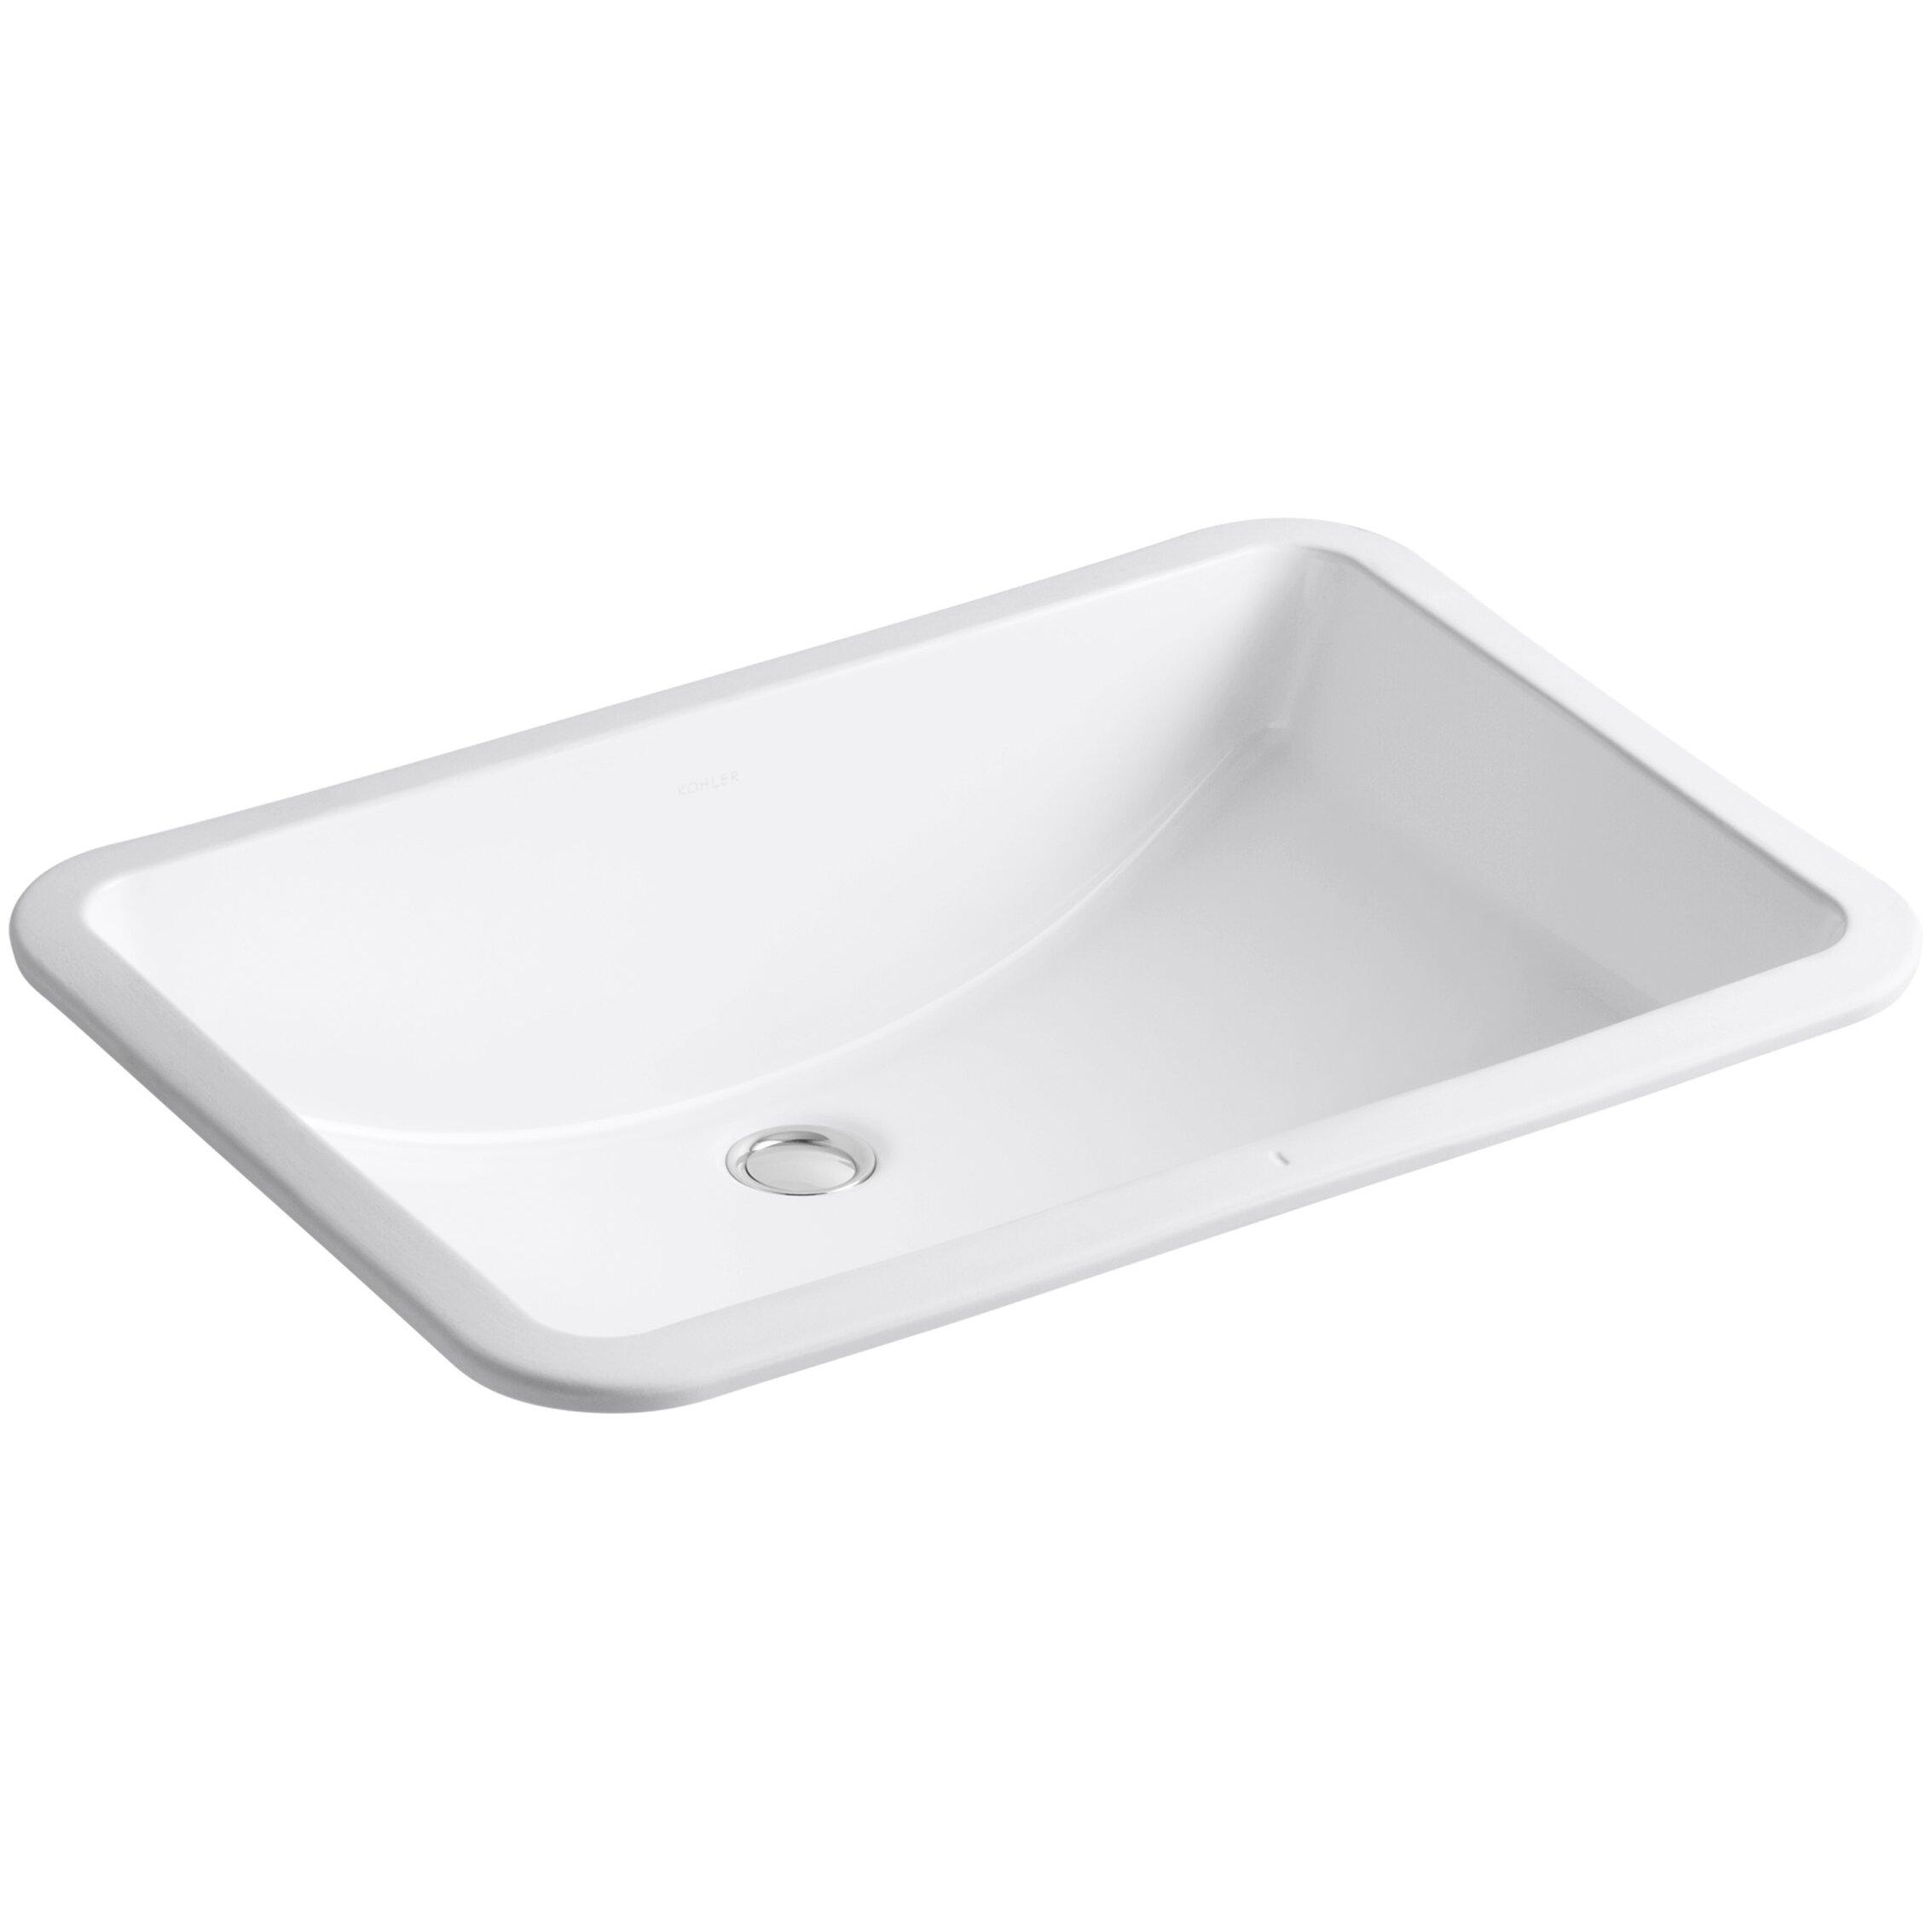 Kohler Ladena Undermount Bathroom Sink. Kohler Ladena Undermount Bathroom Sink   Reviews   Wayfair